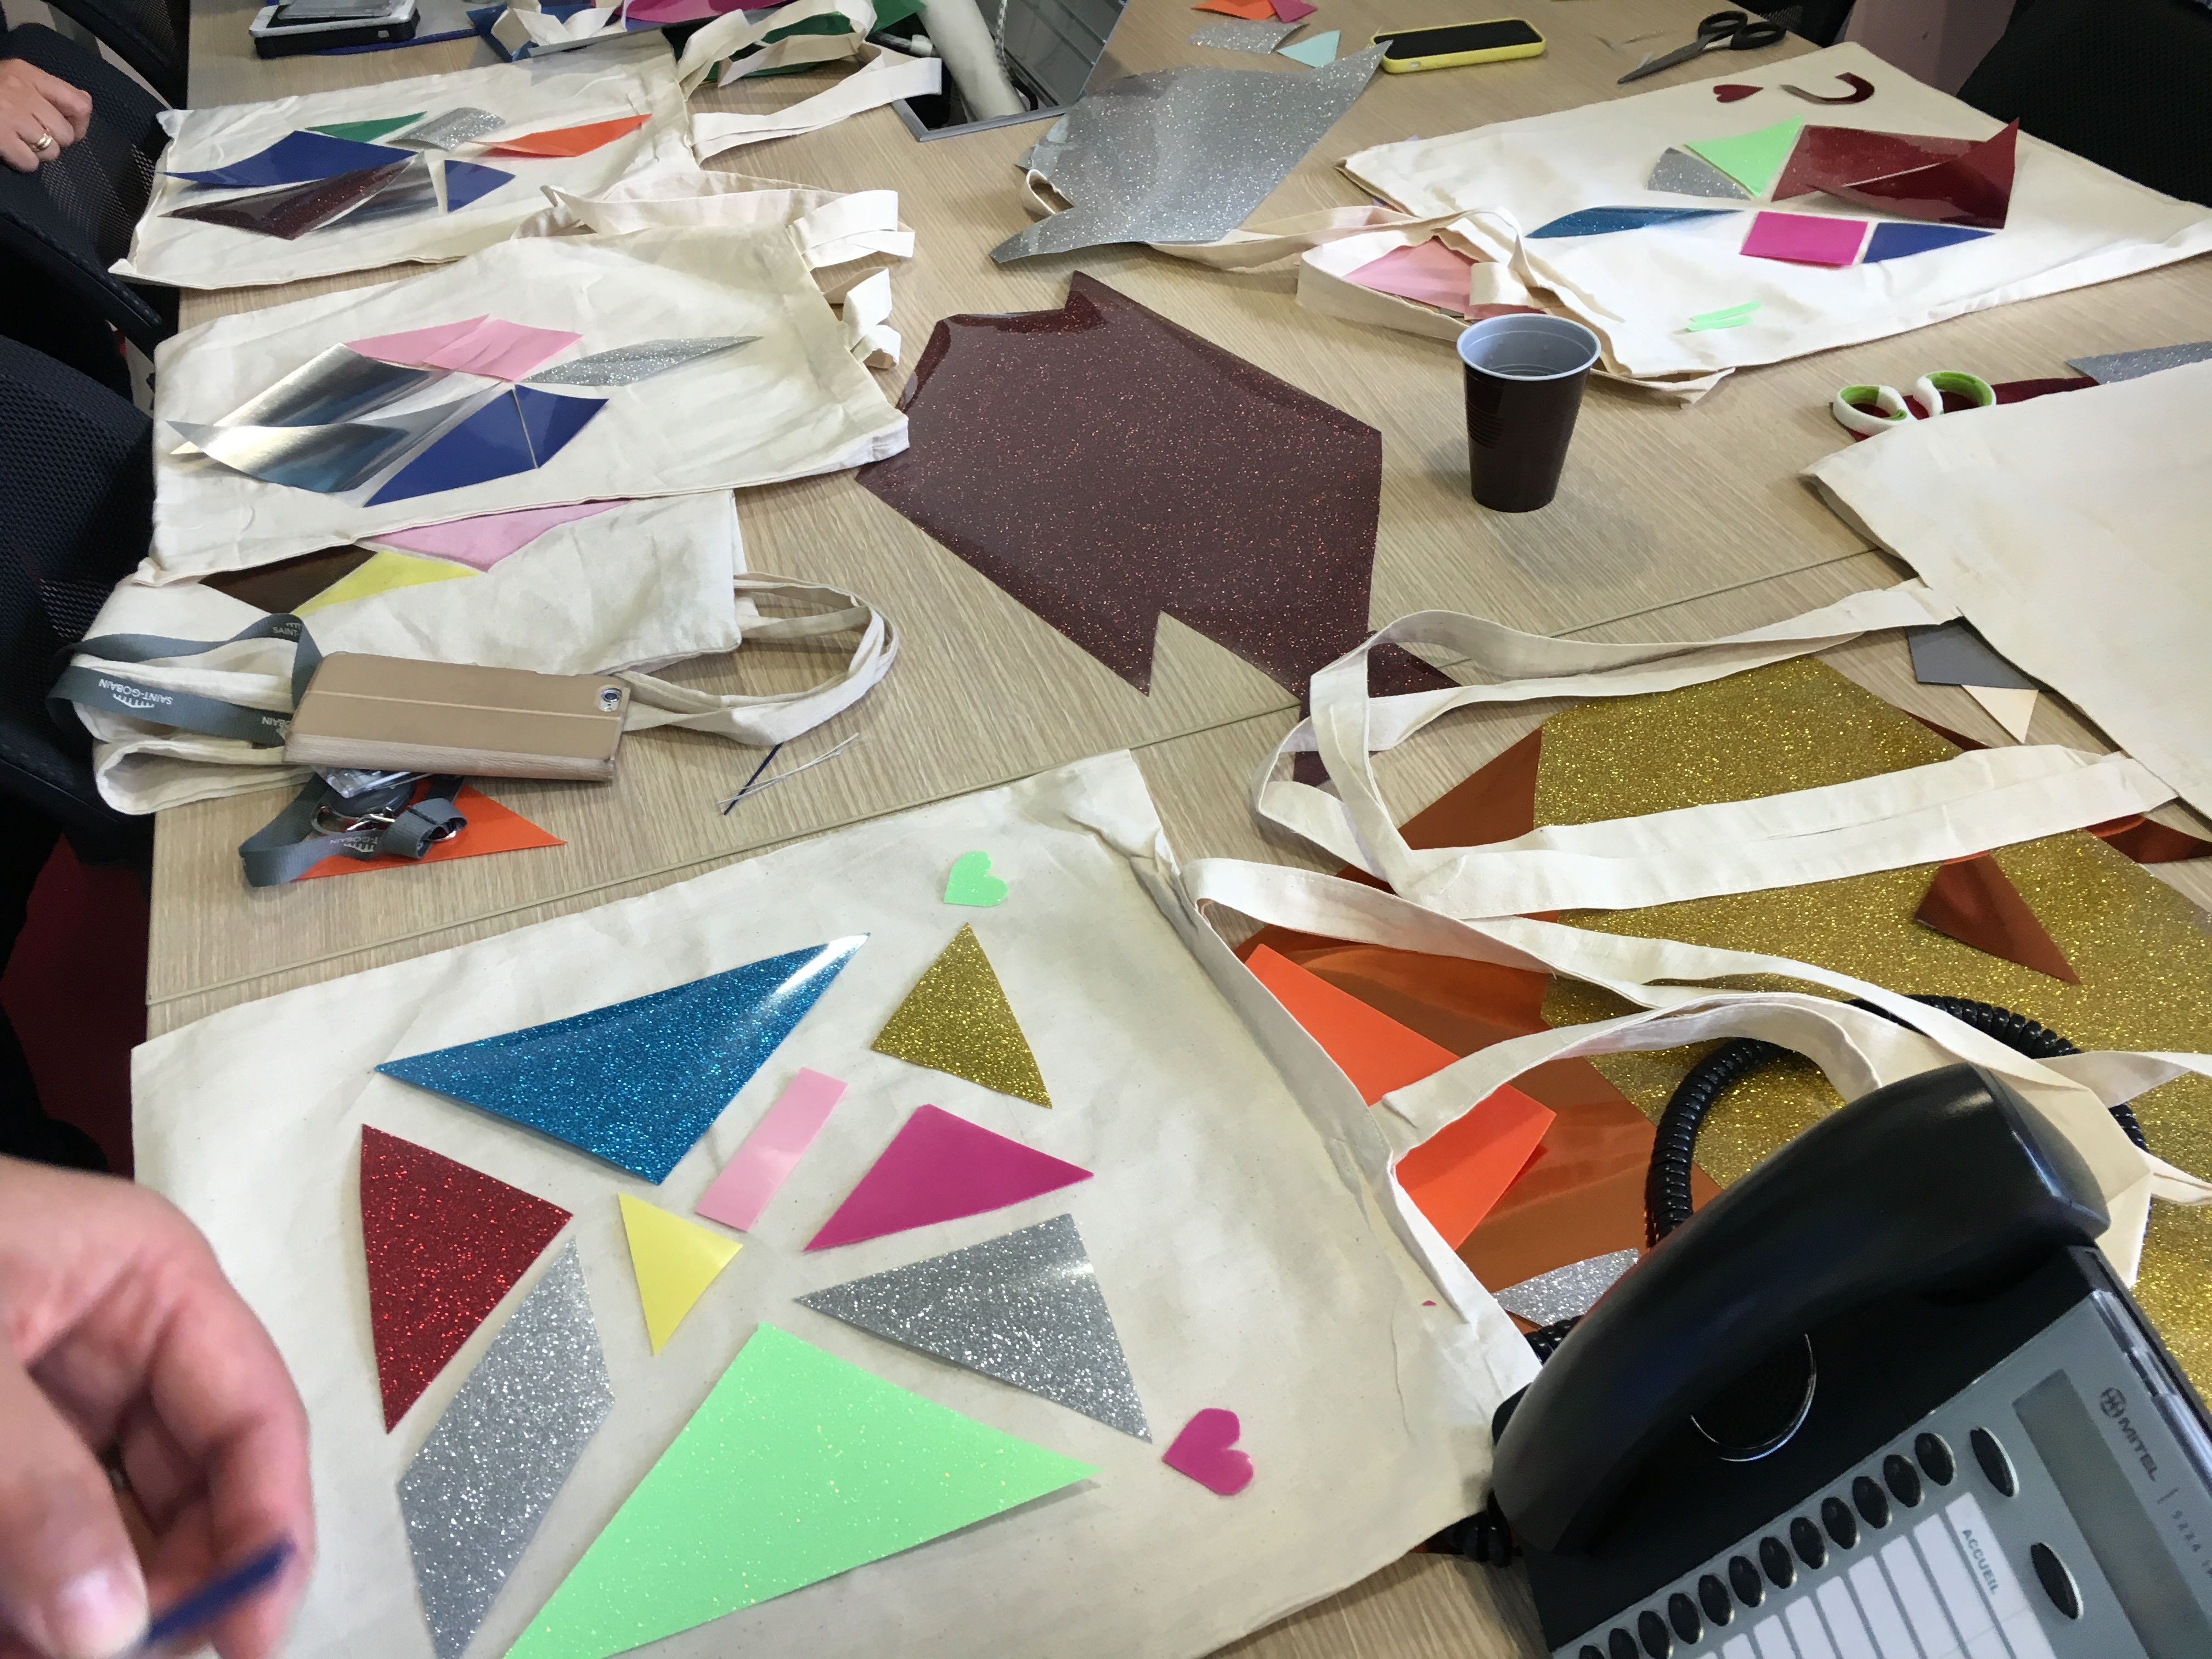 atelier creatif diy cusomisation pimp tote bag tangram thermocollant